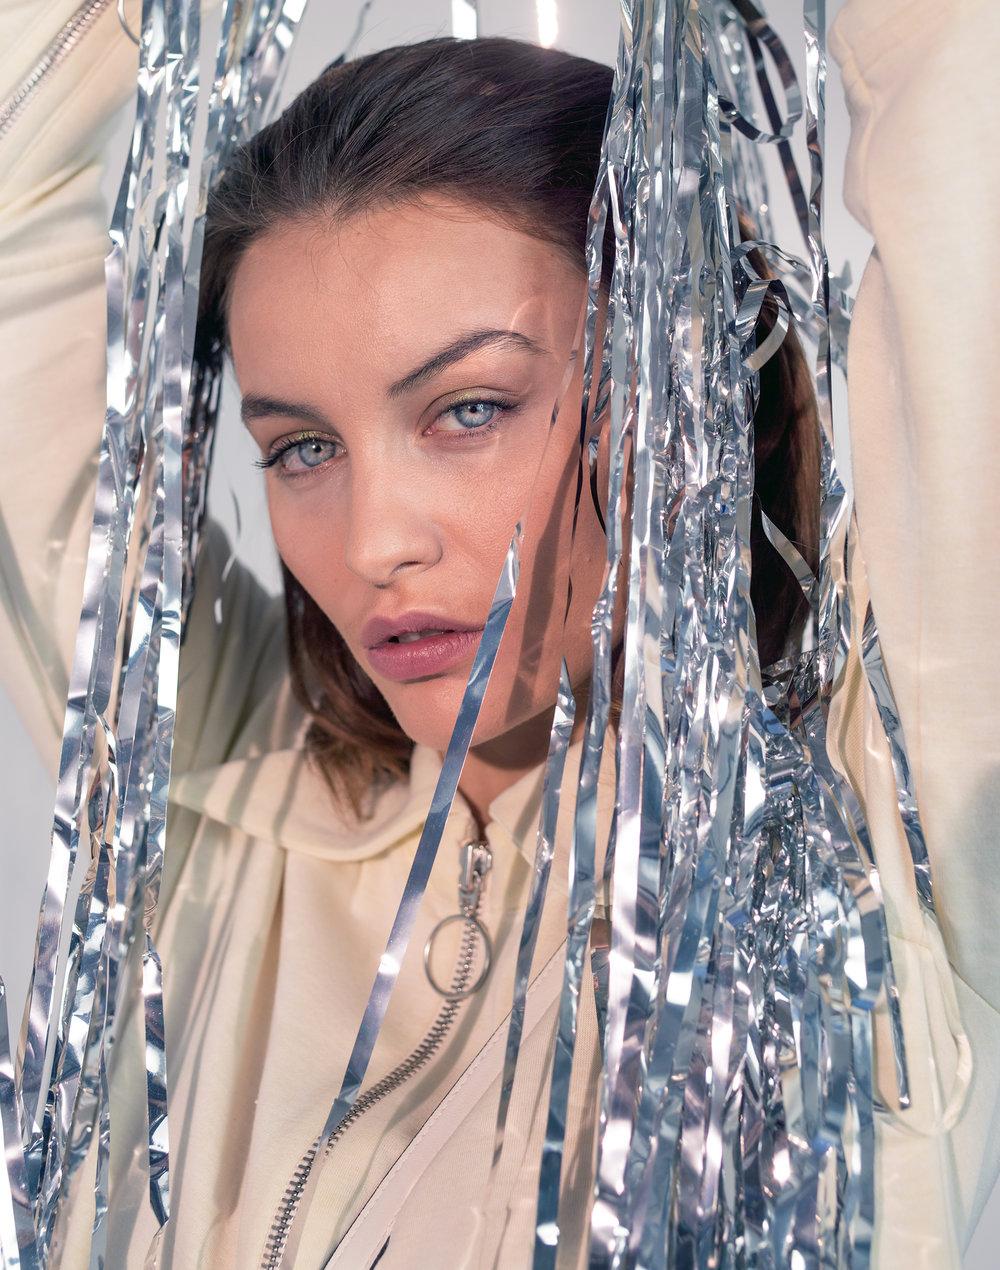 Roxane_Moreau_-_Sportswear_467.jpg